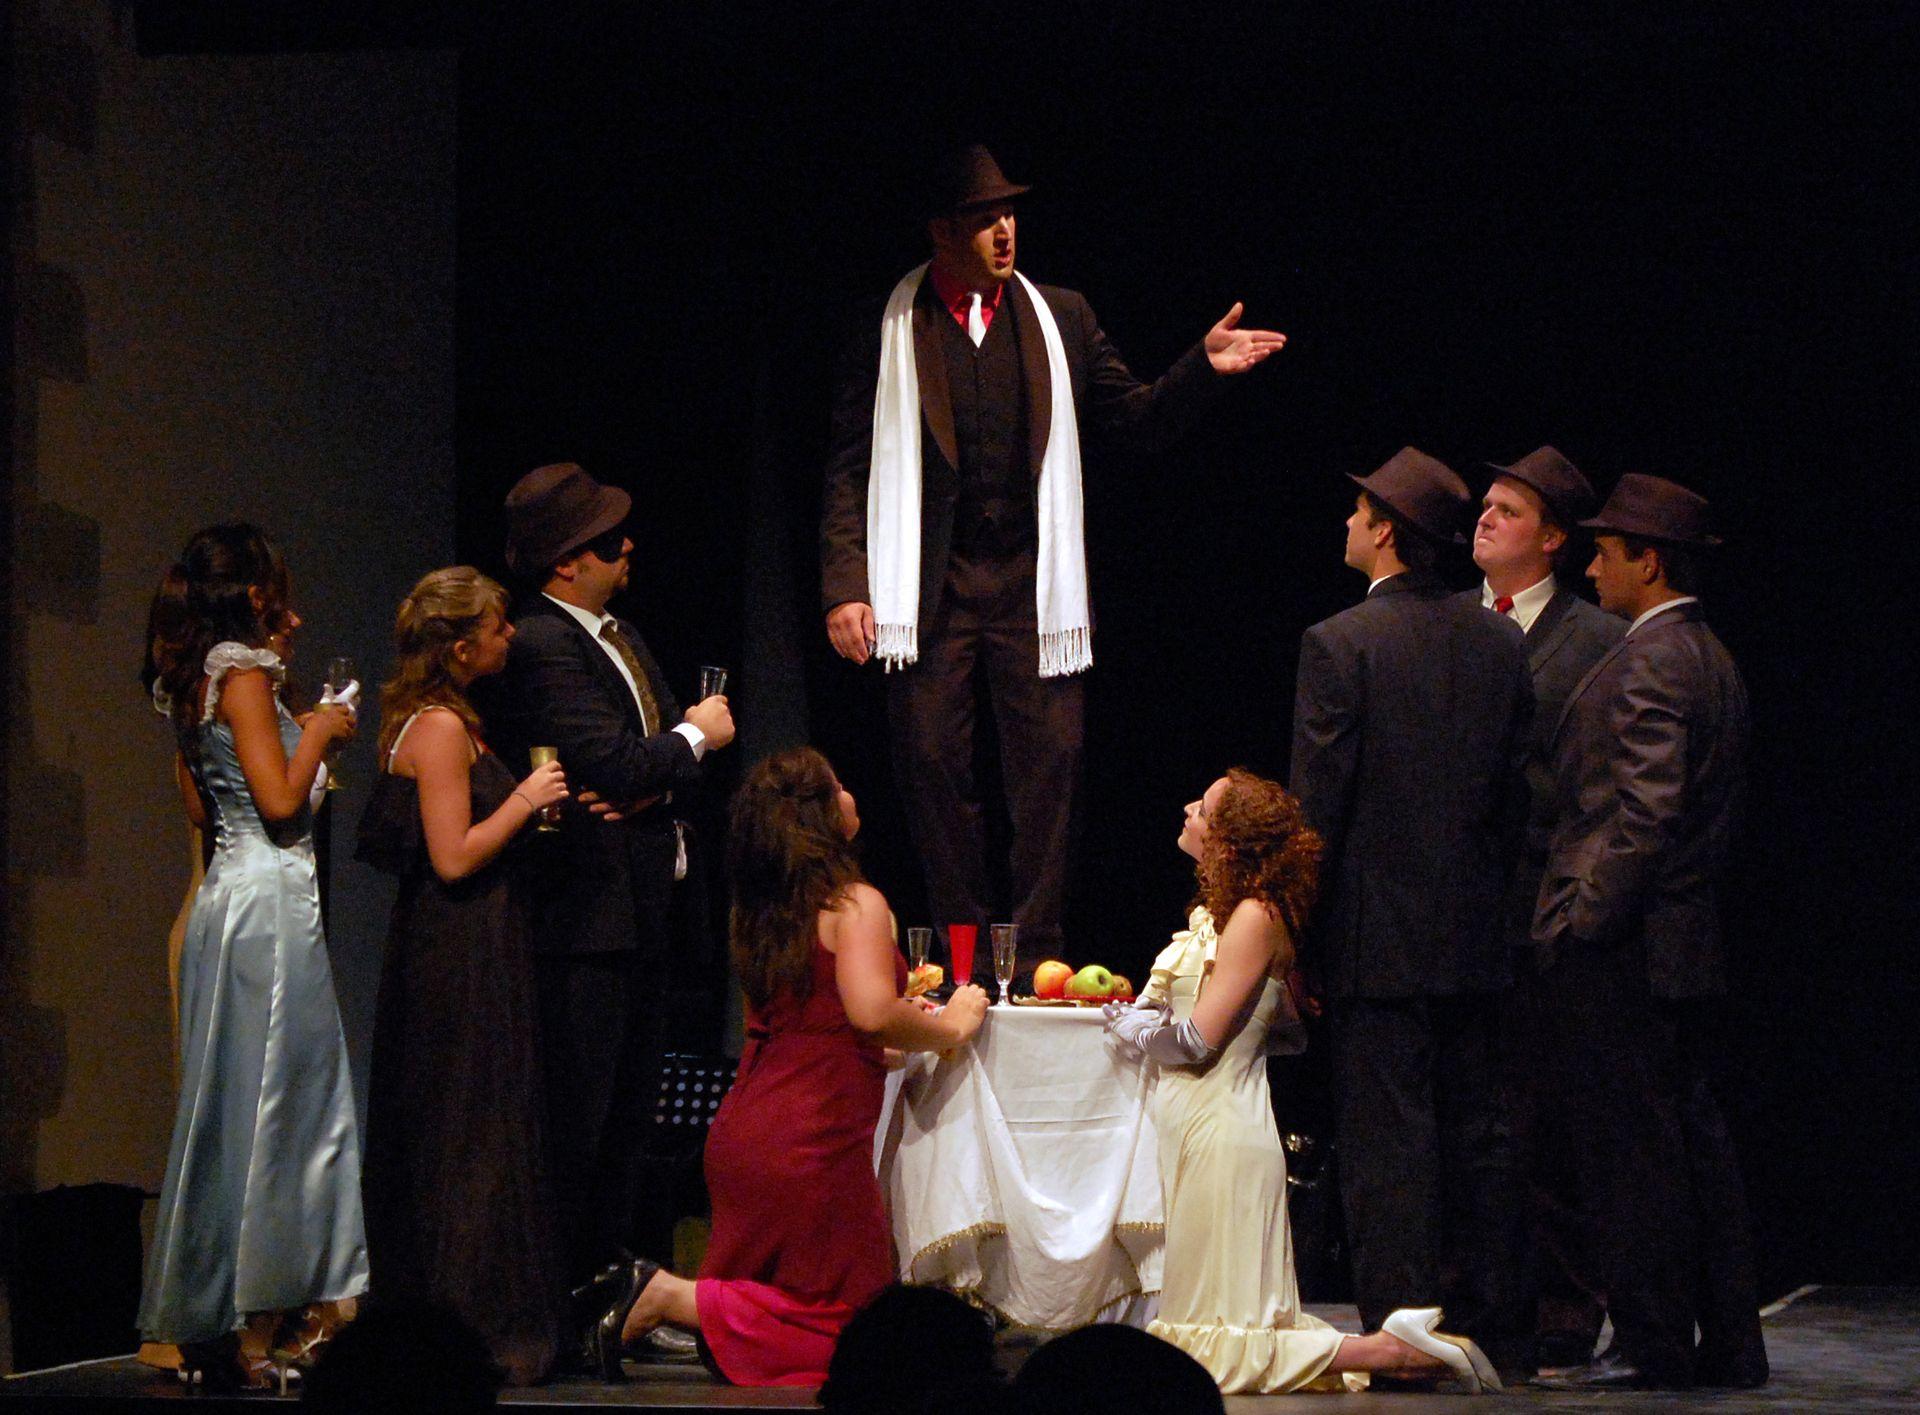 Virginie-Stucki-Recup-And-Cut-Grigny-Rigoletto-Festival Lyrique-en-mer-Opéra-Verdi